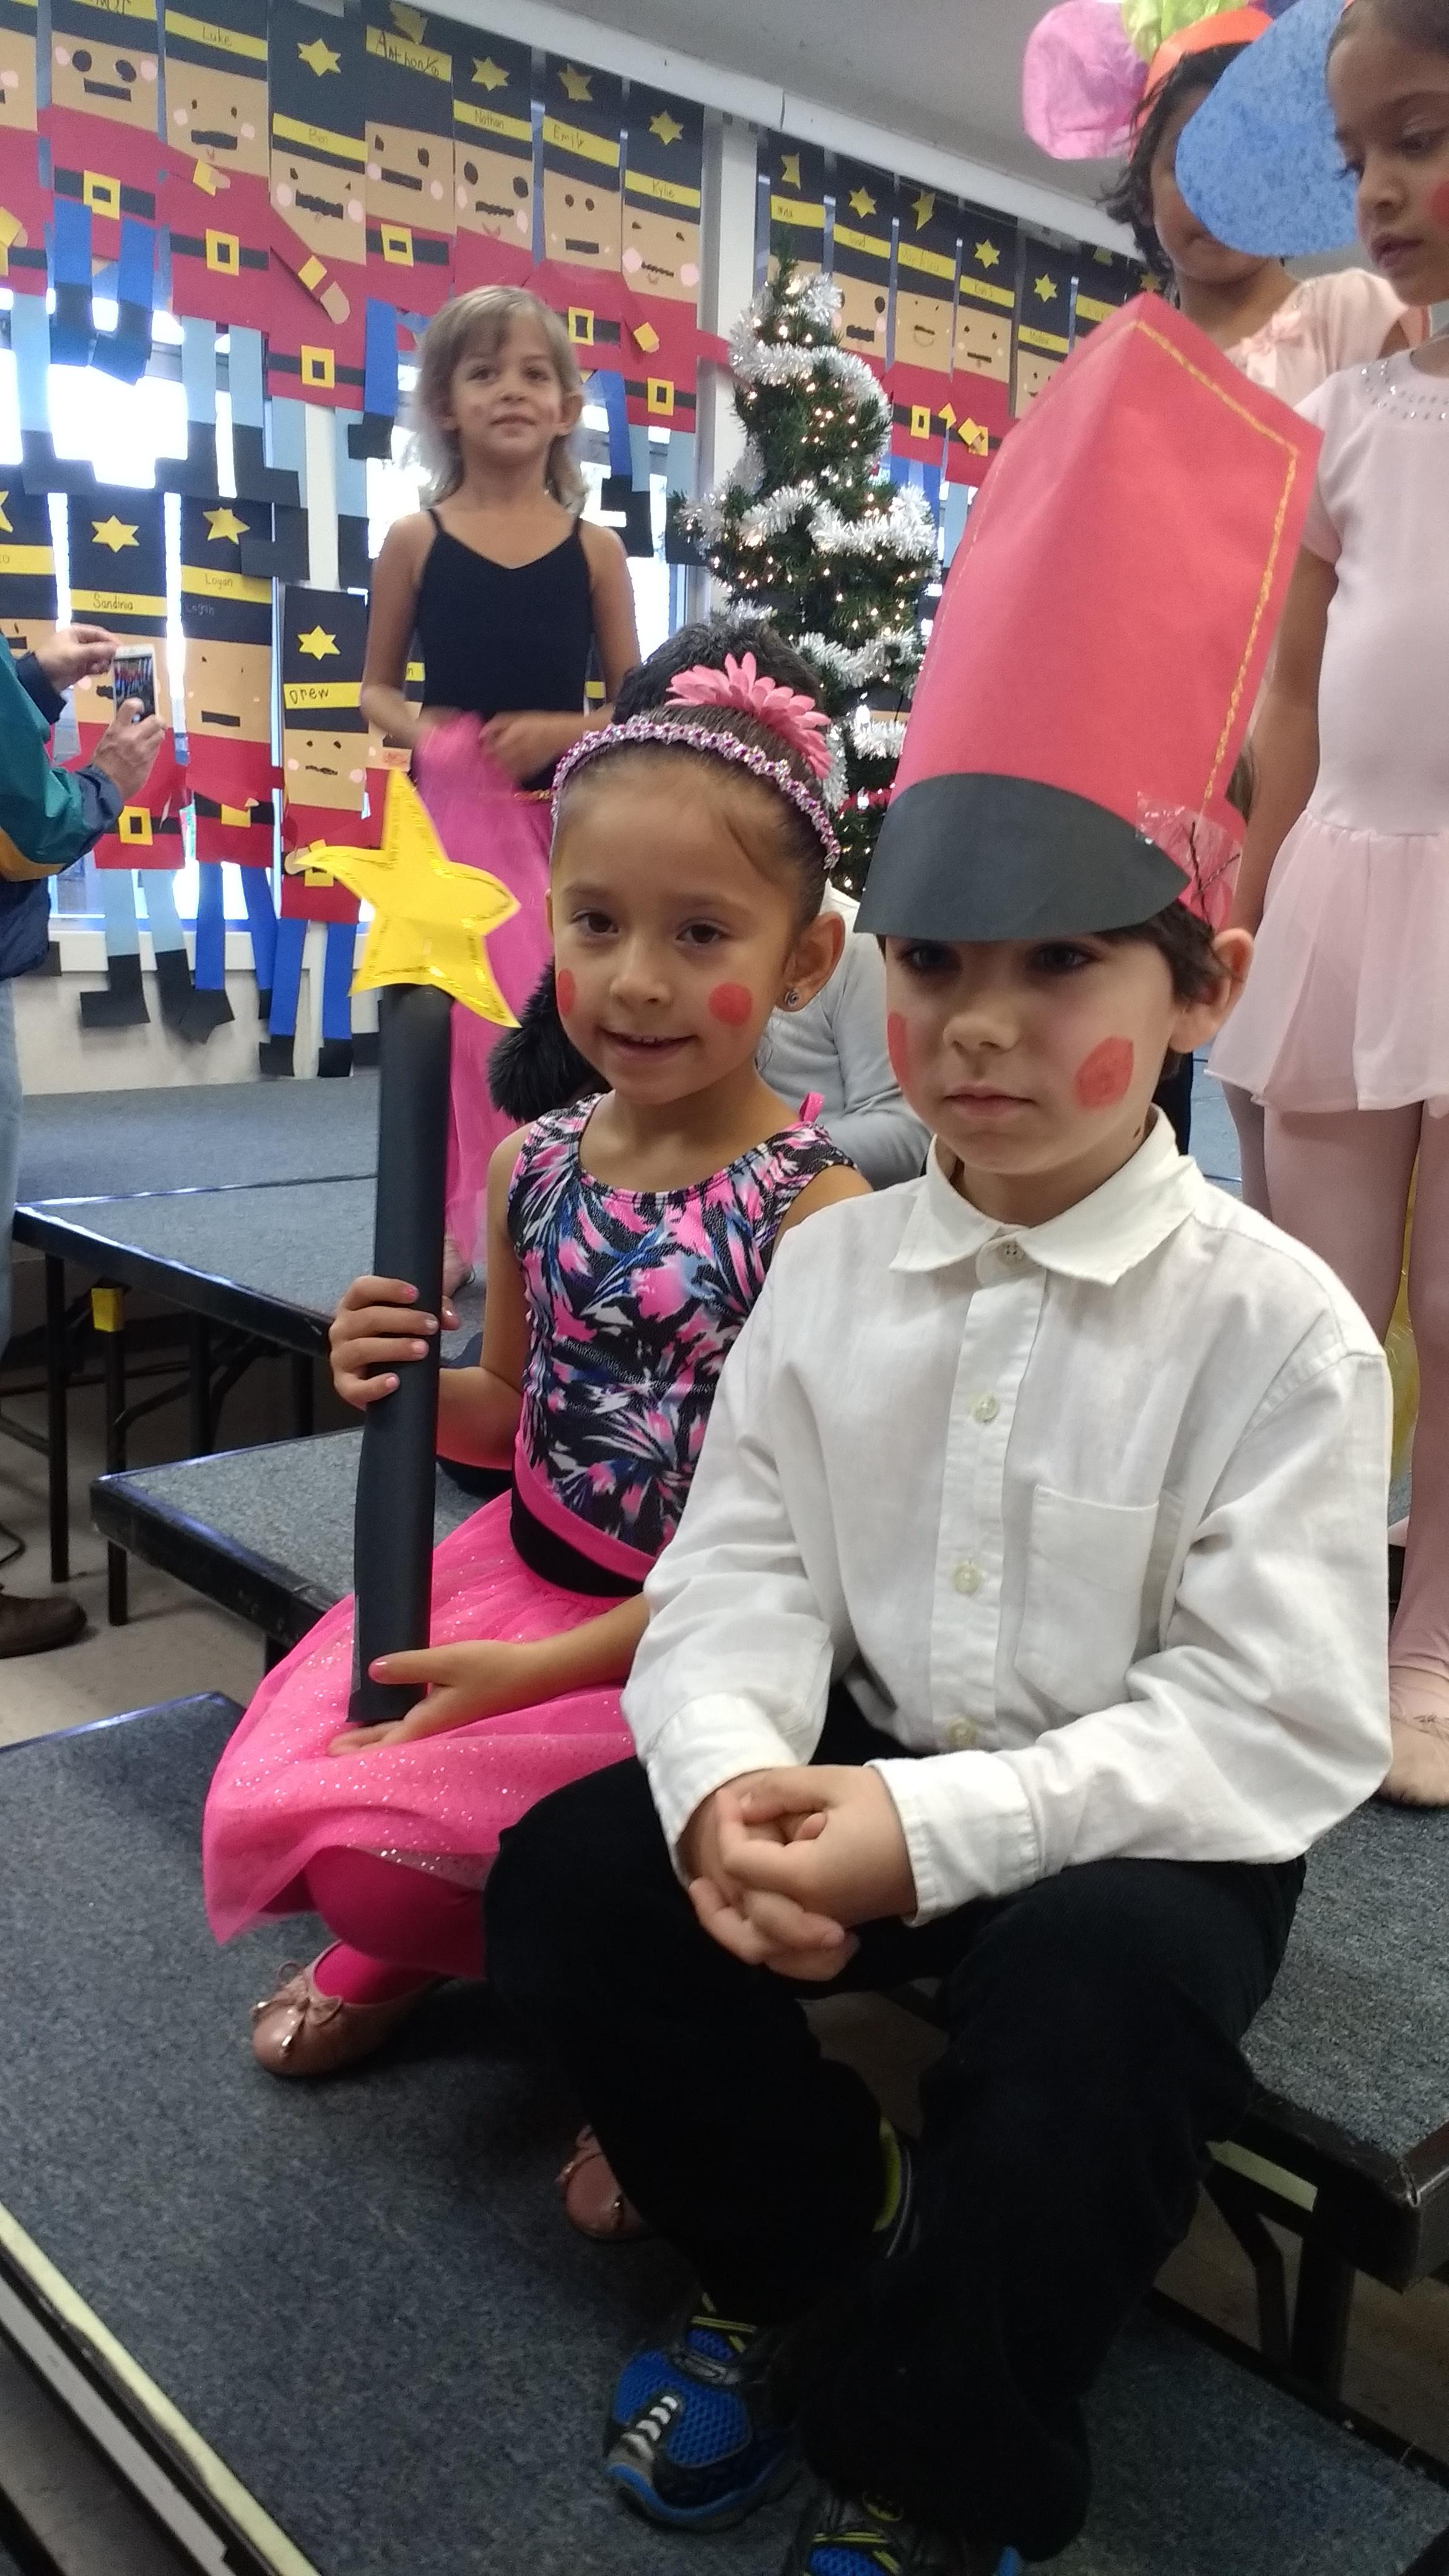 Mateus & Luciana - The Nutcracker, Alta Vista School, CA